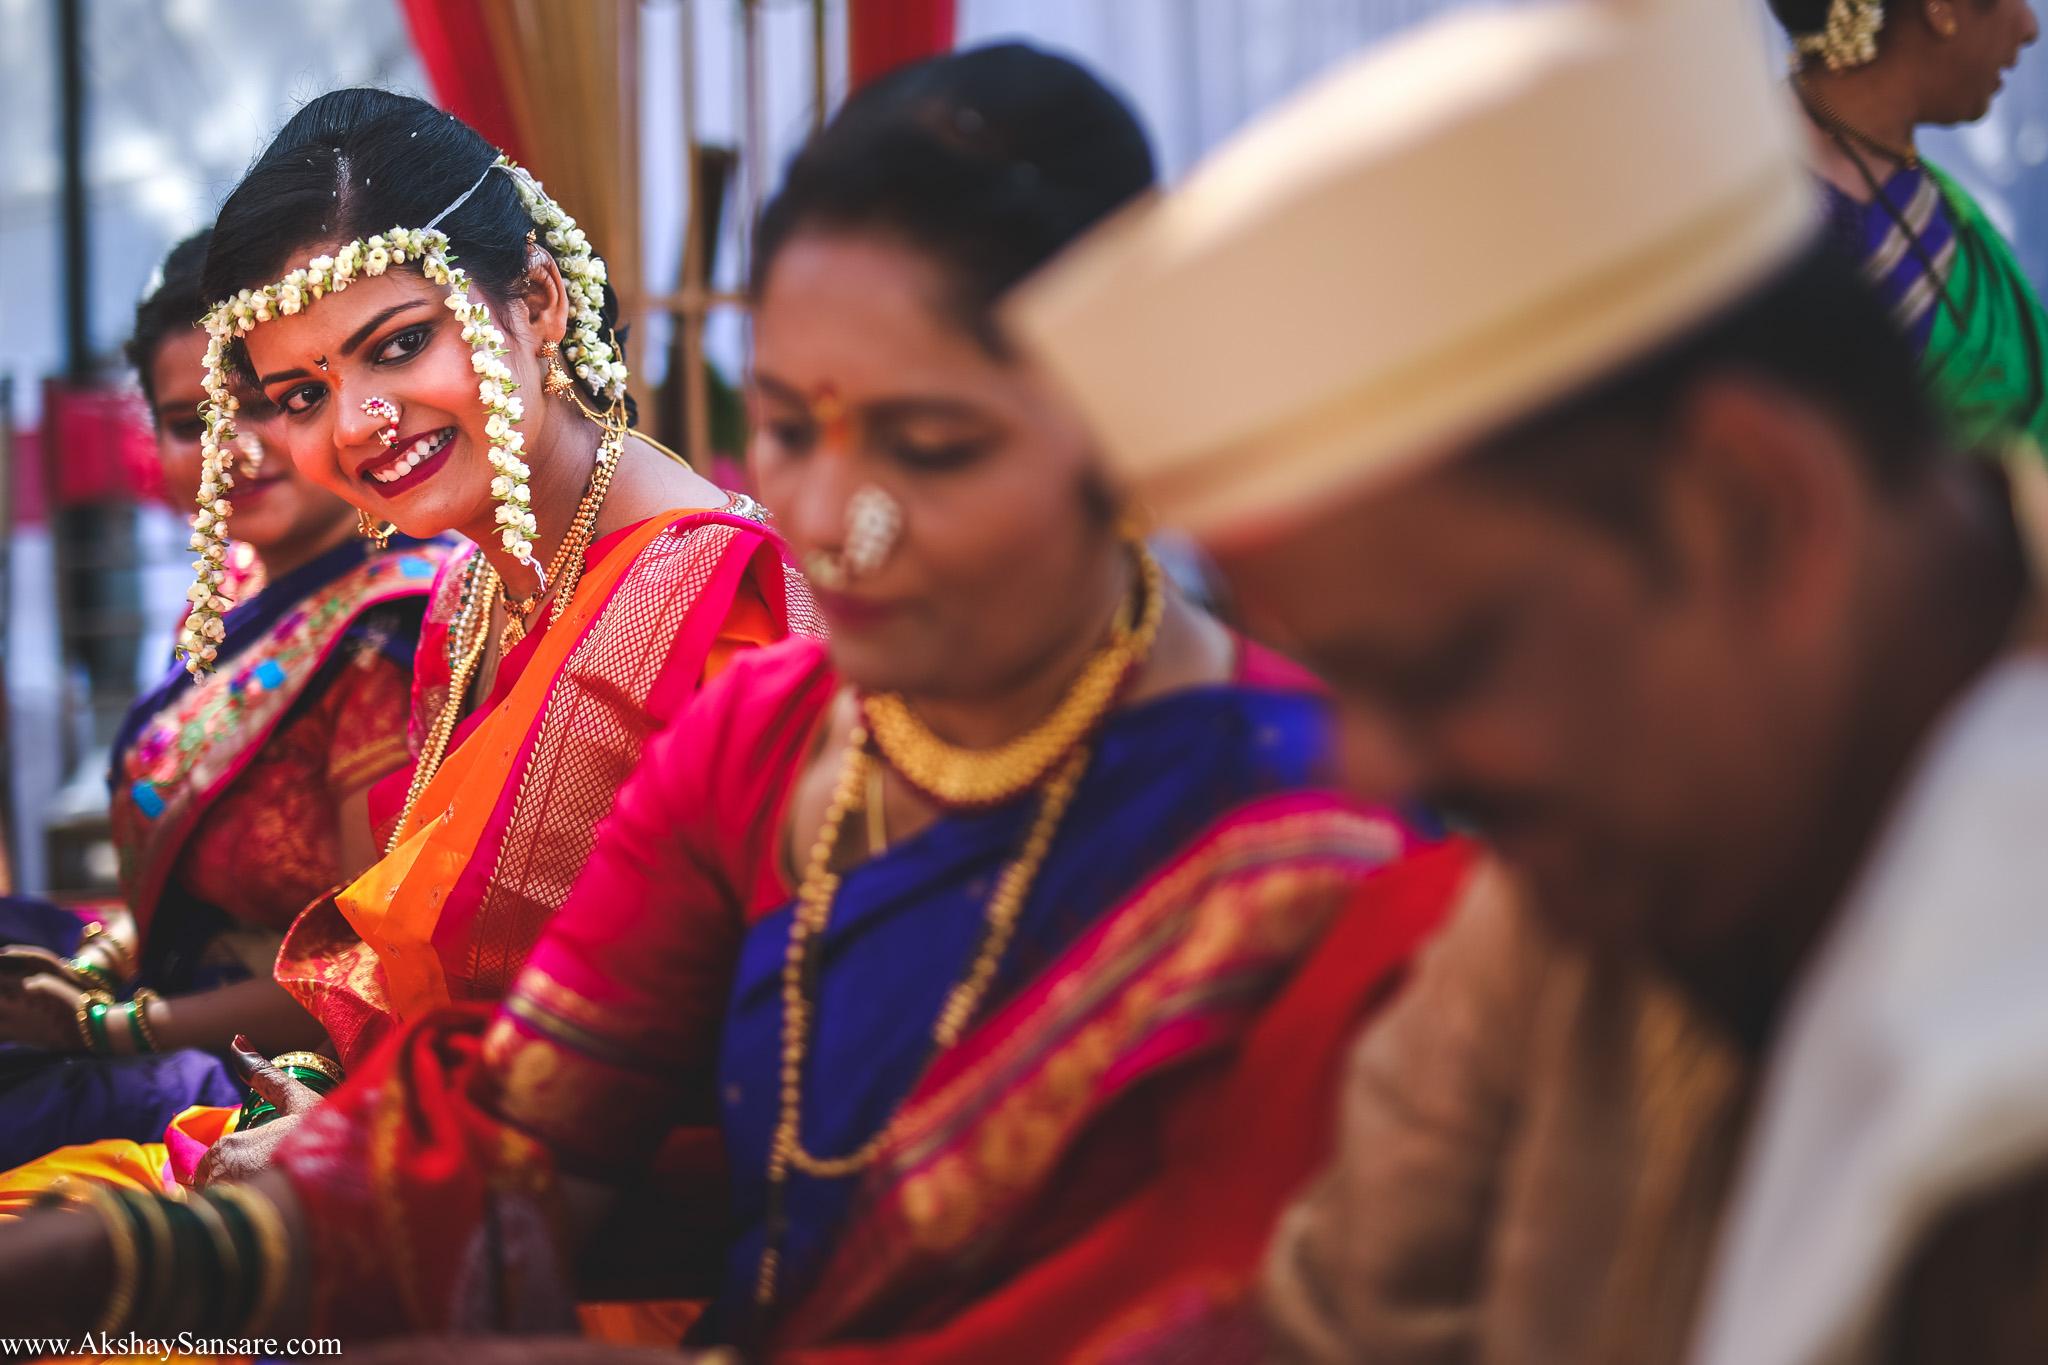 Salil x Kimaya Akshay Sansare Photography Candid wedding Photographer in mumbai best(8).jpg